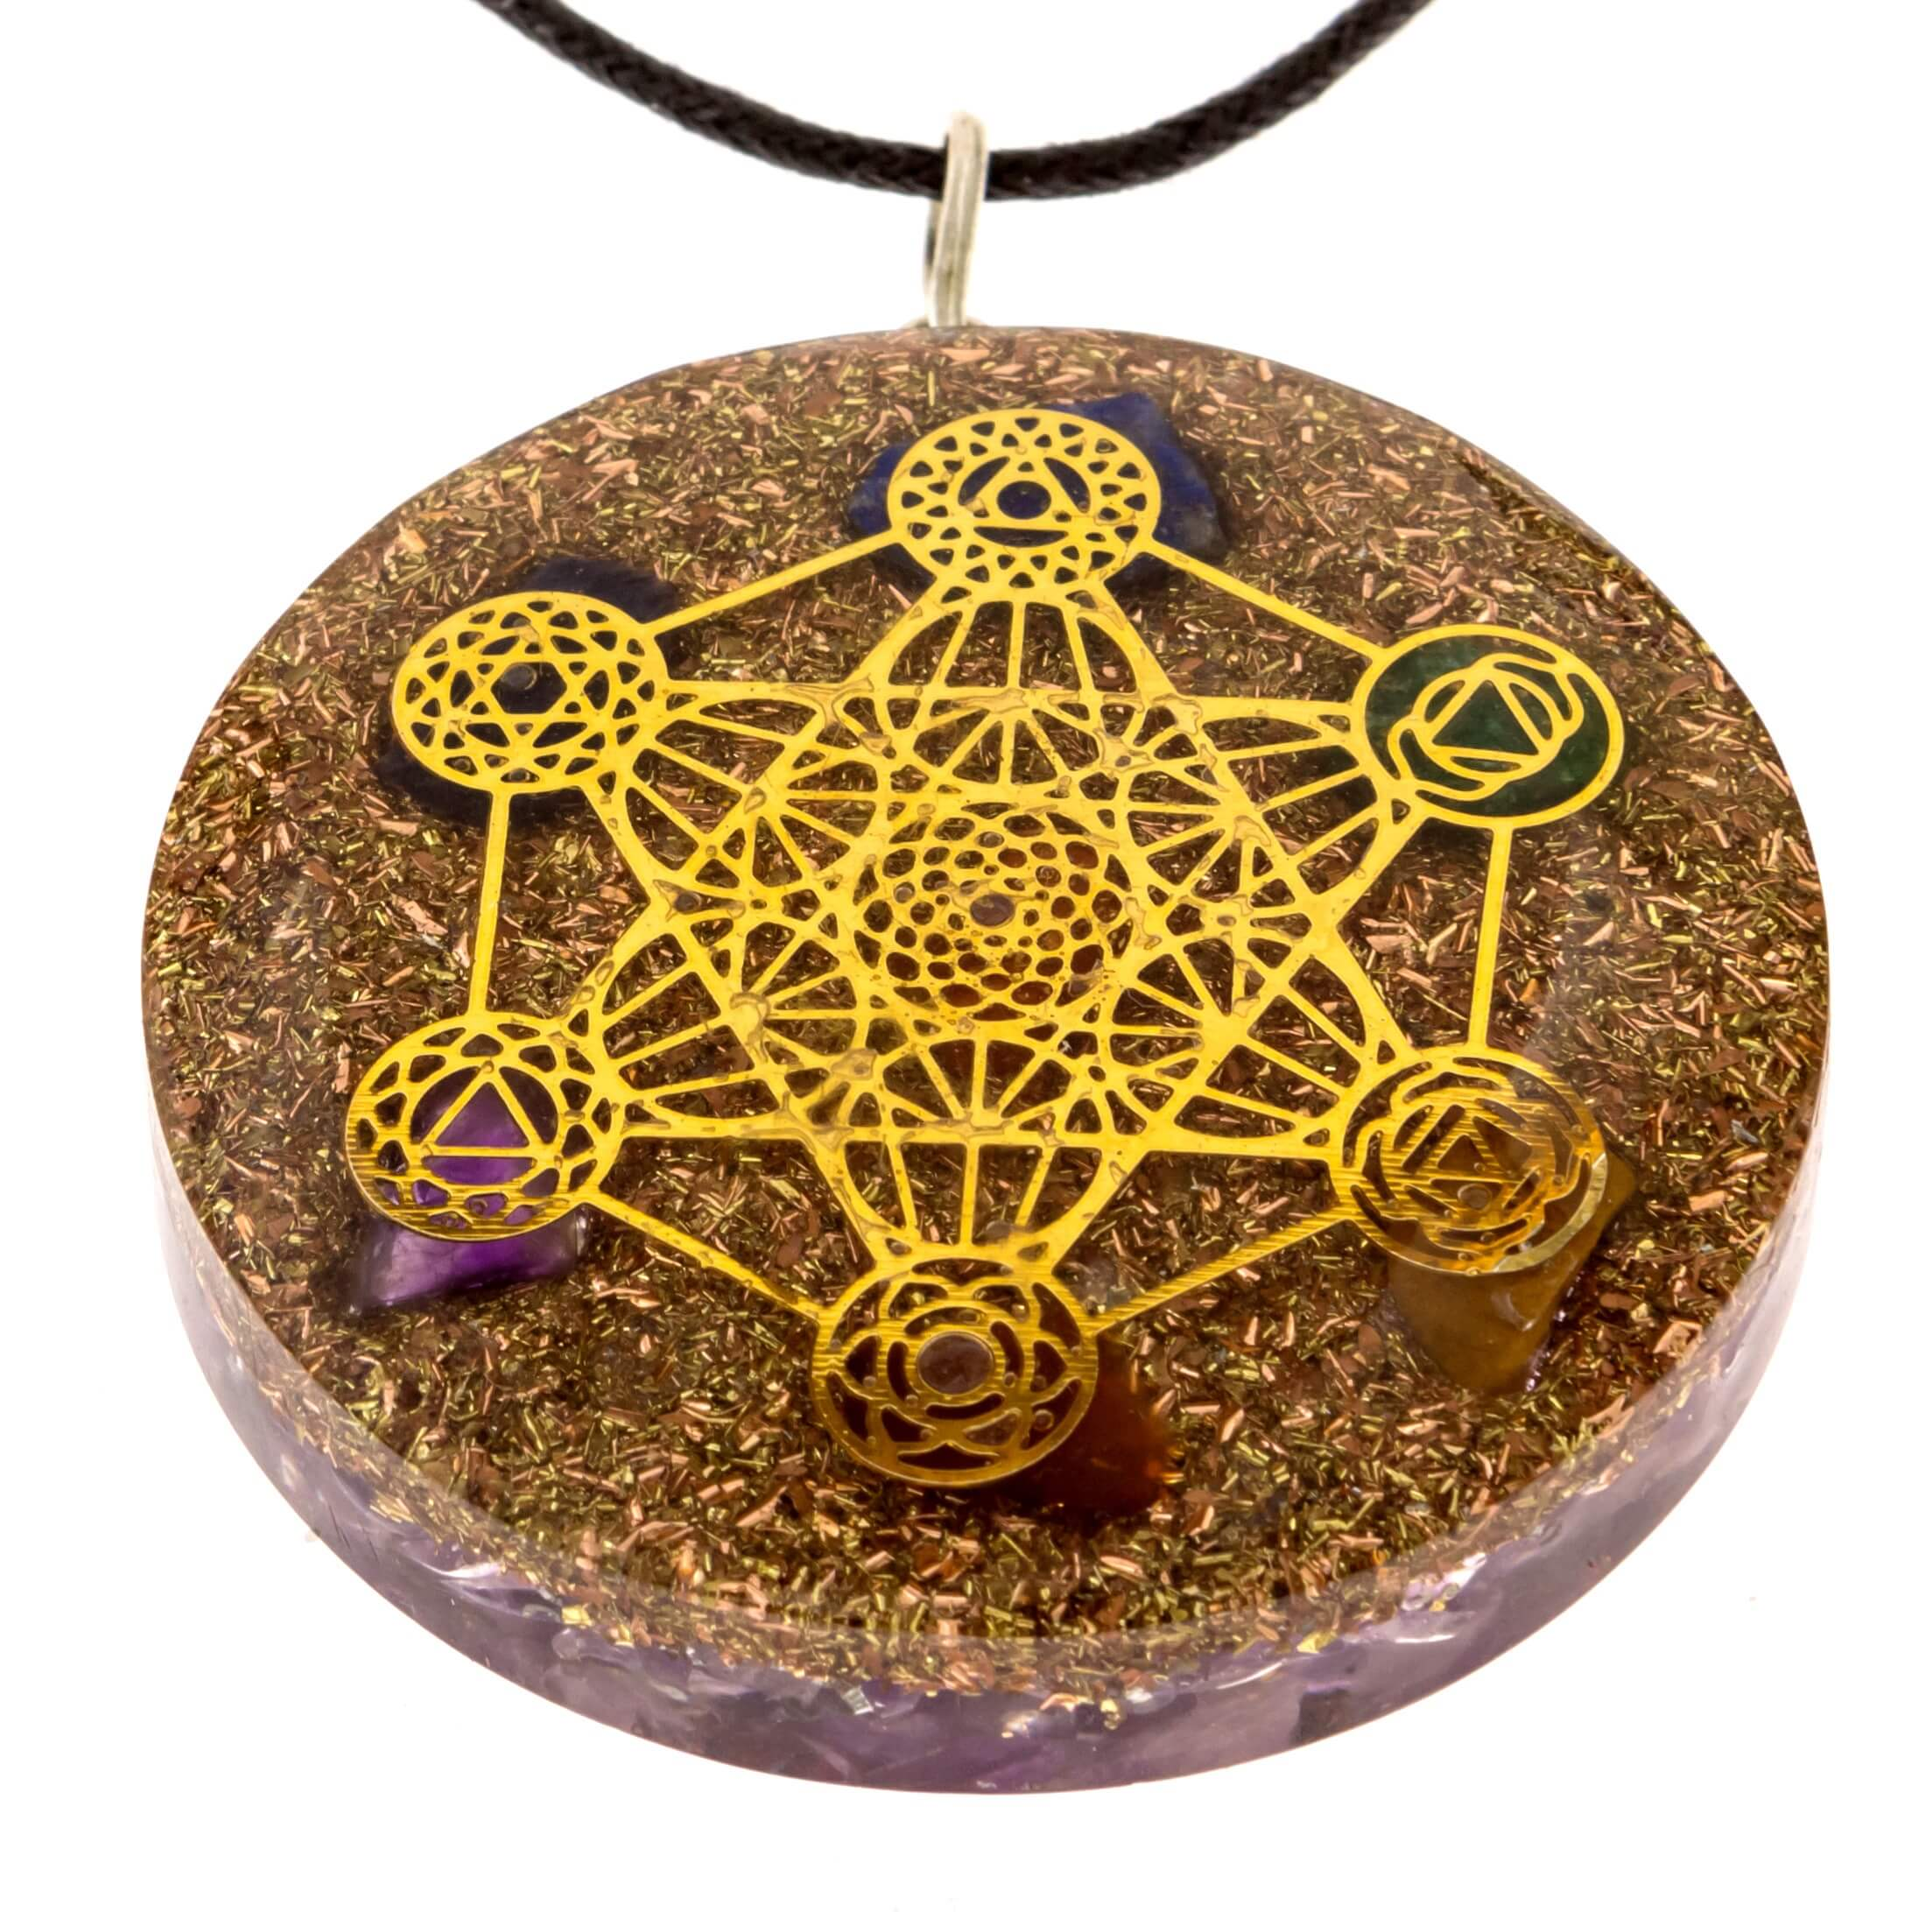 Metatron cube merkaba orgone pendant for sale ralieva metatron cube necklaces aloadofball Images